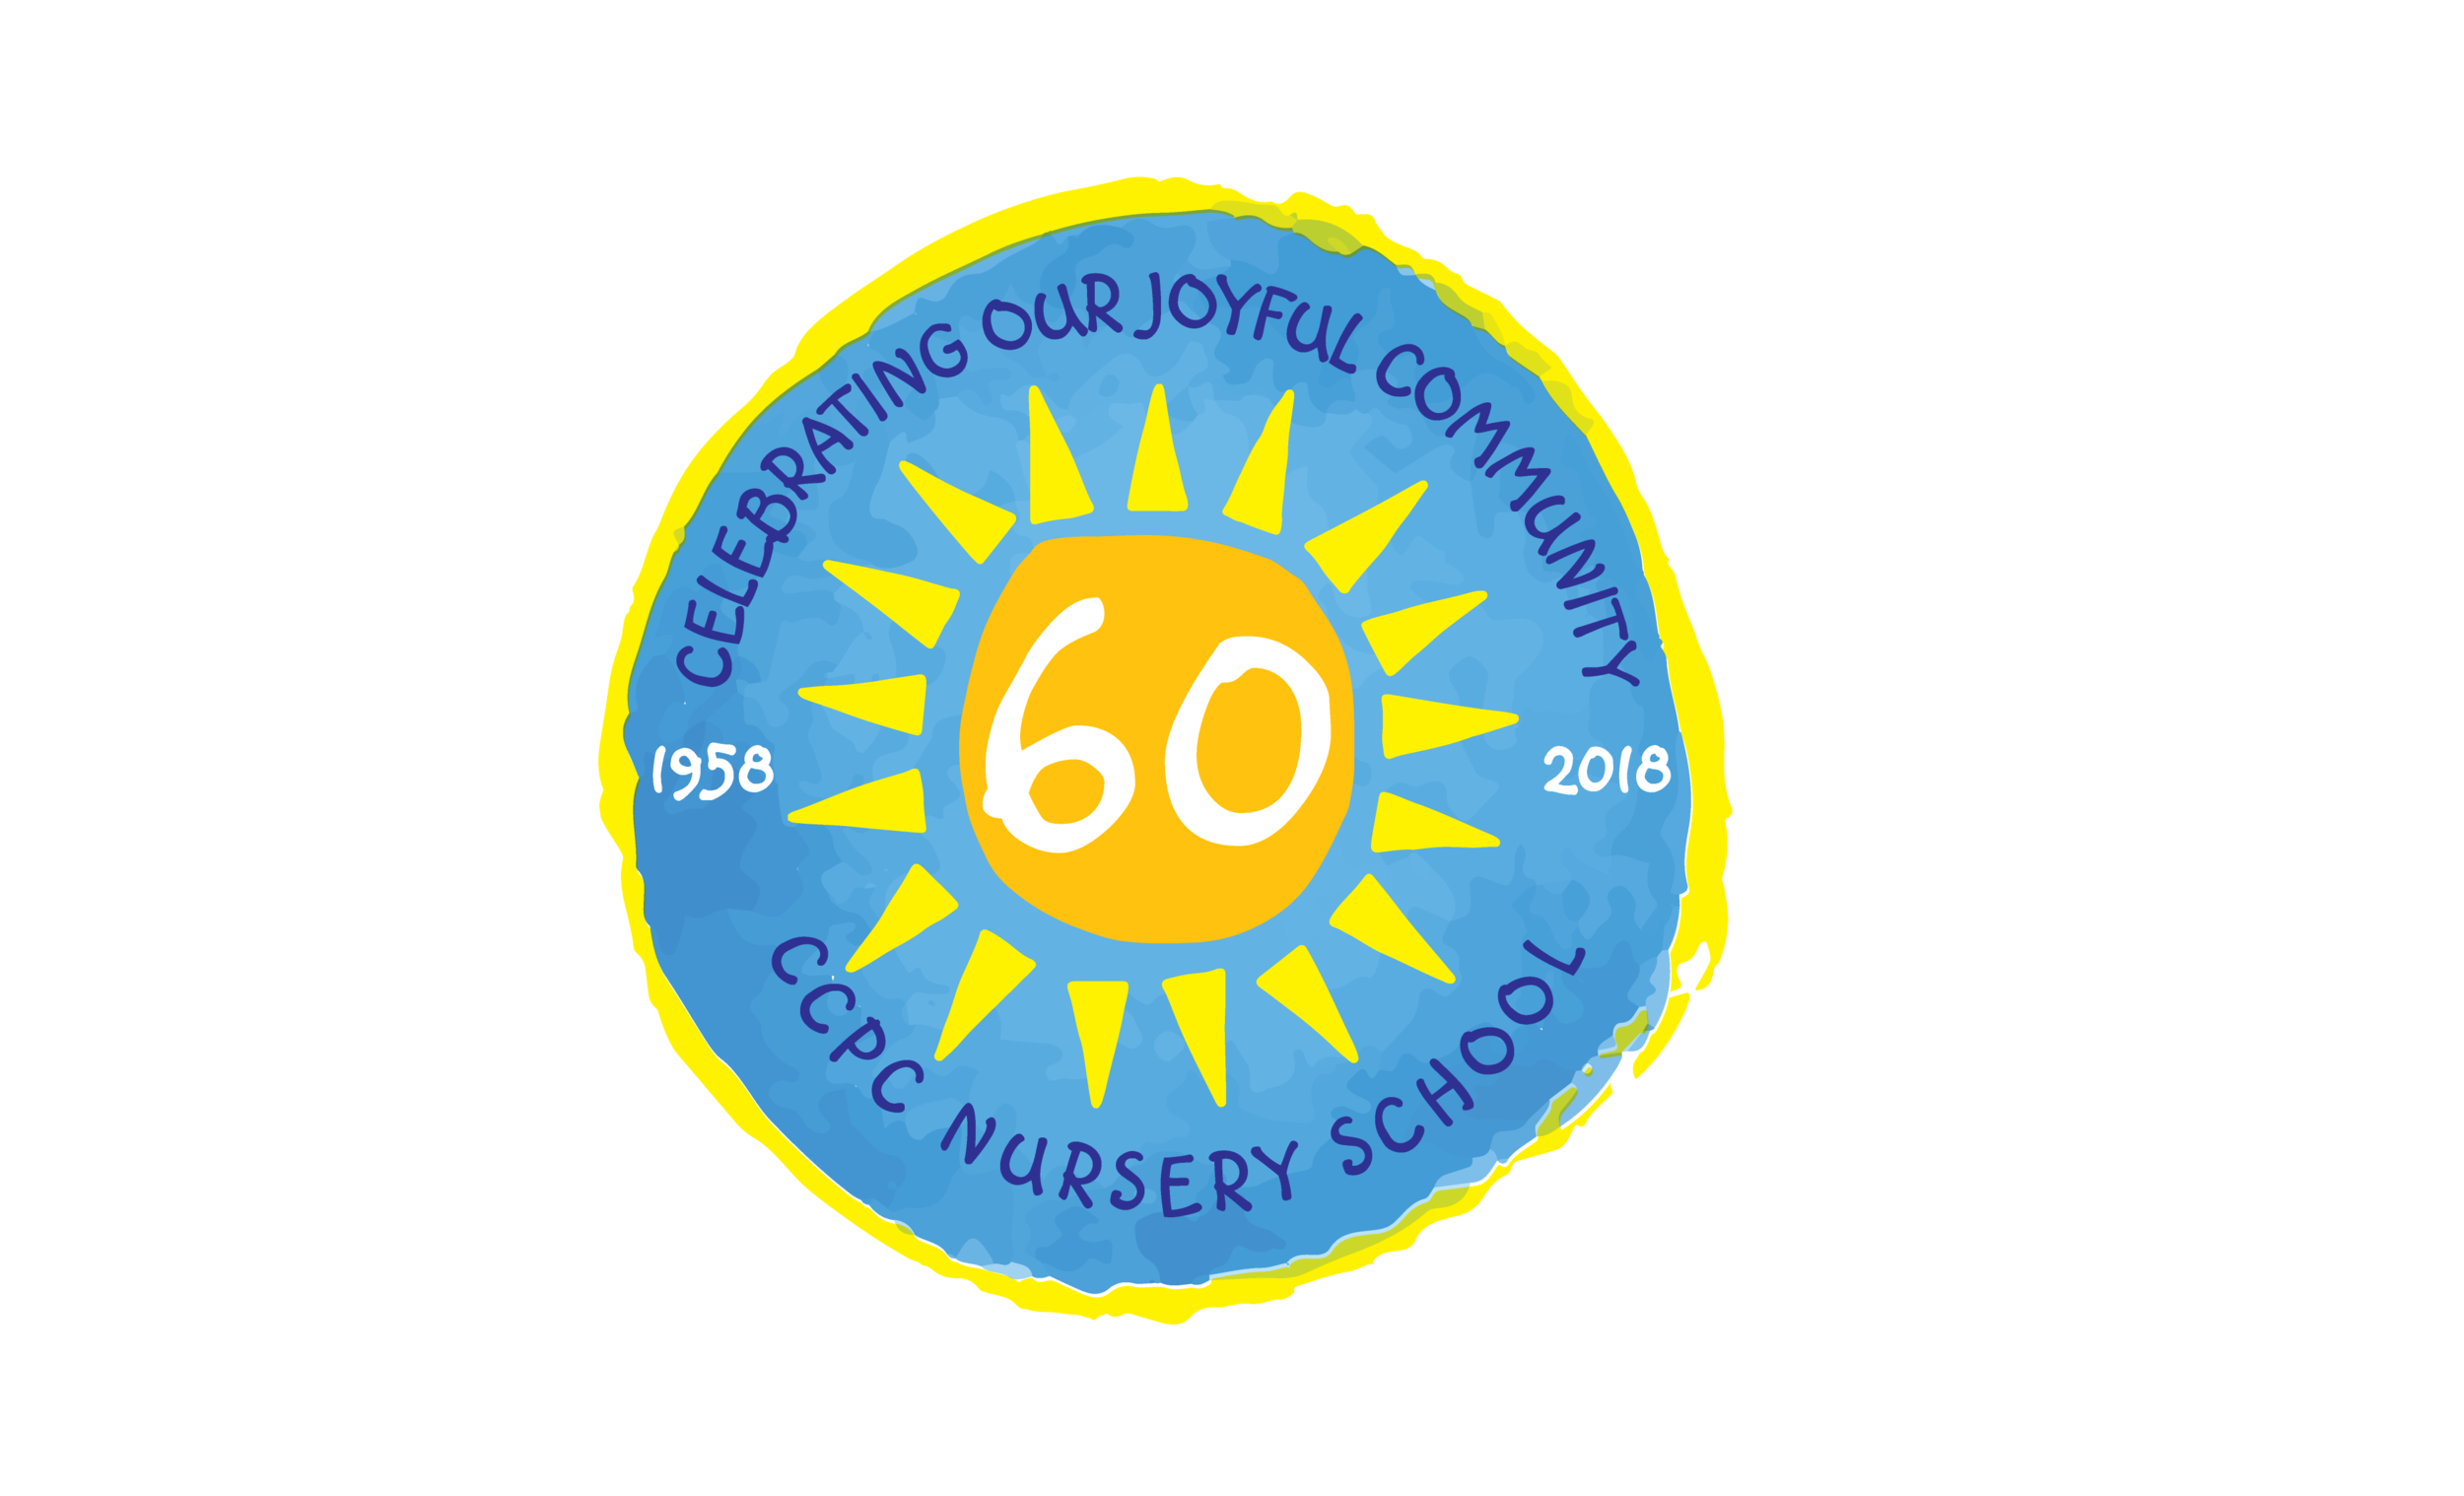 NURSERY SCHOOL 60TH -Final-Blue & Yellow-01.jpg